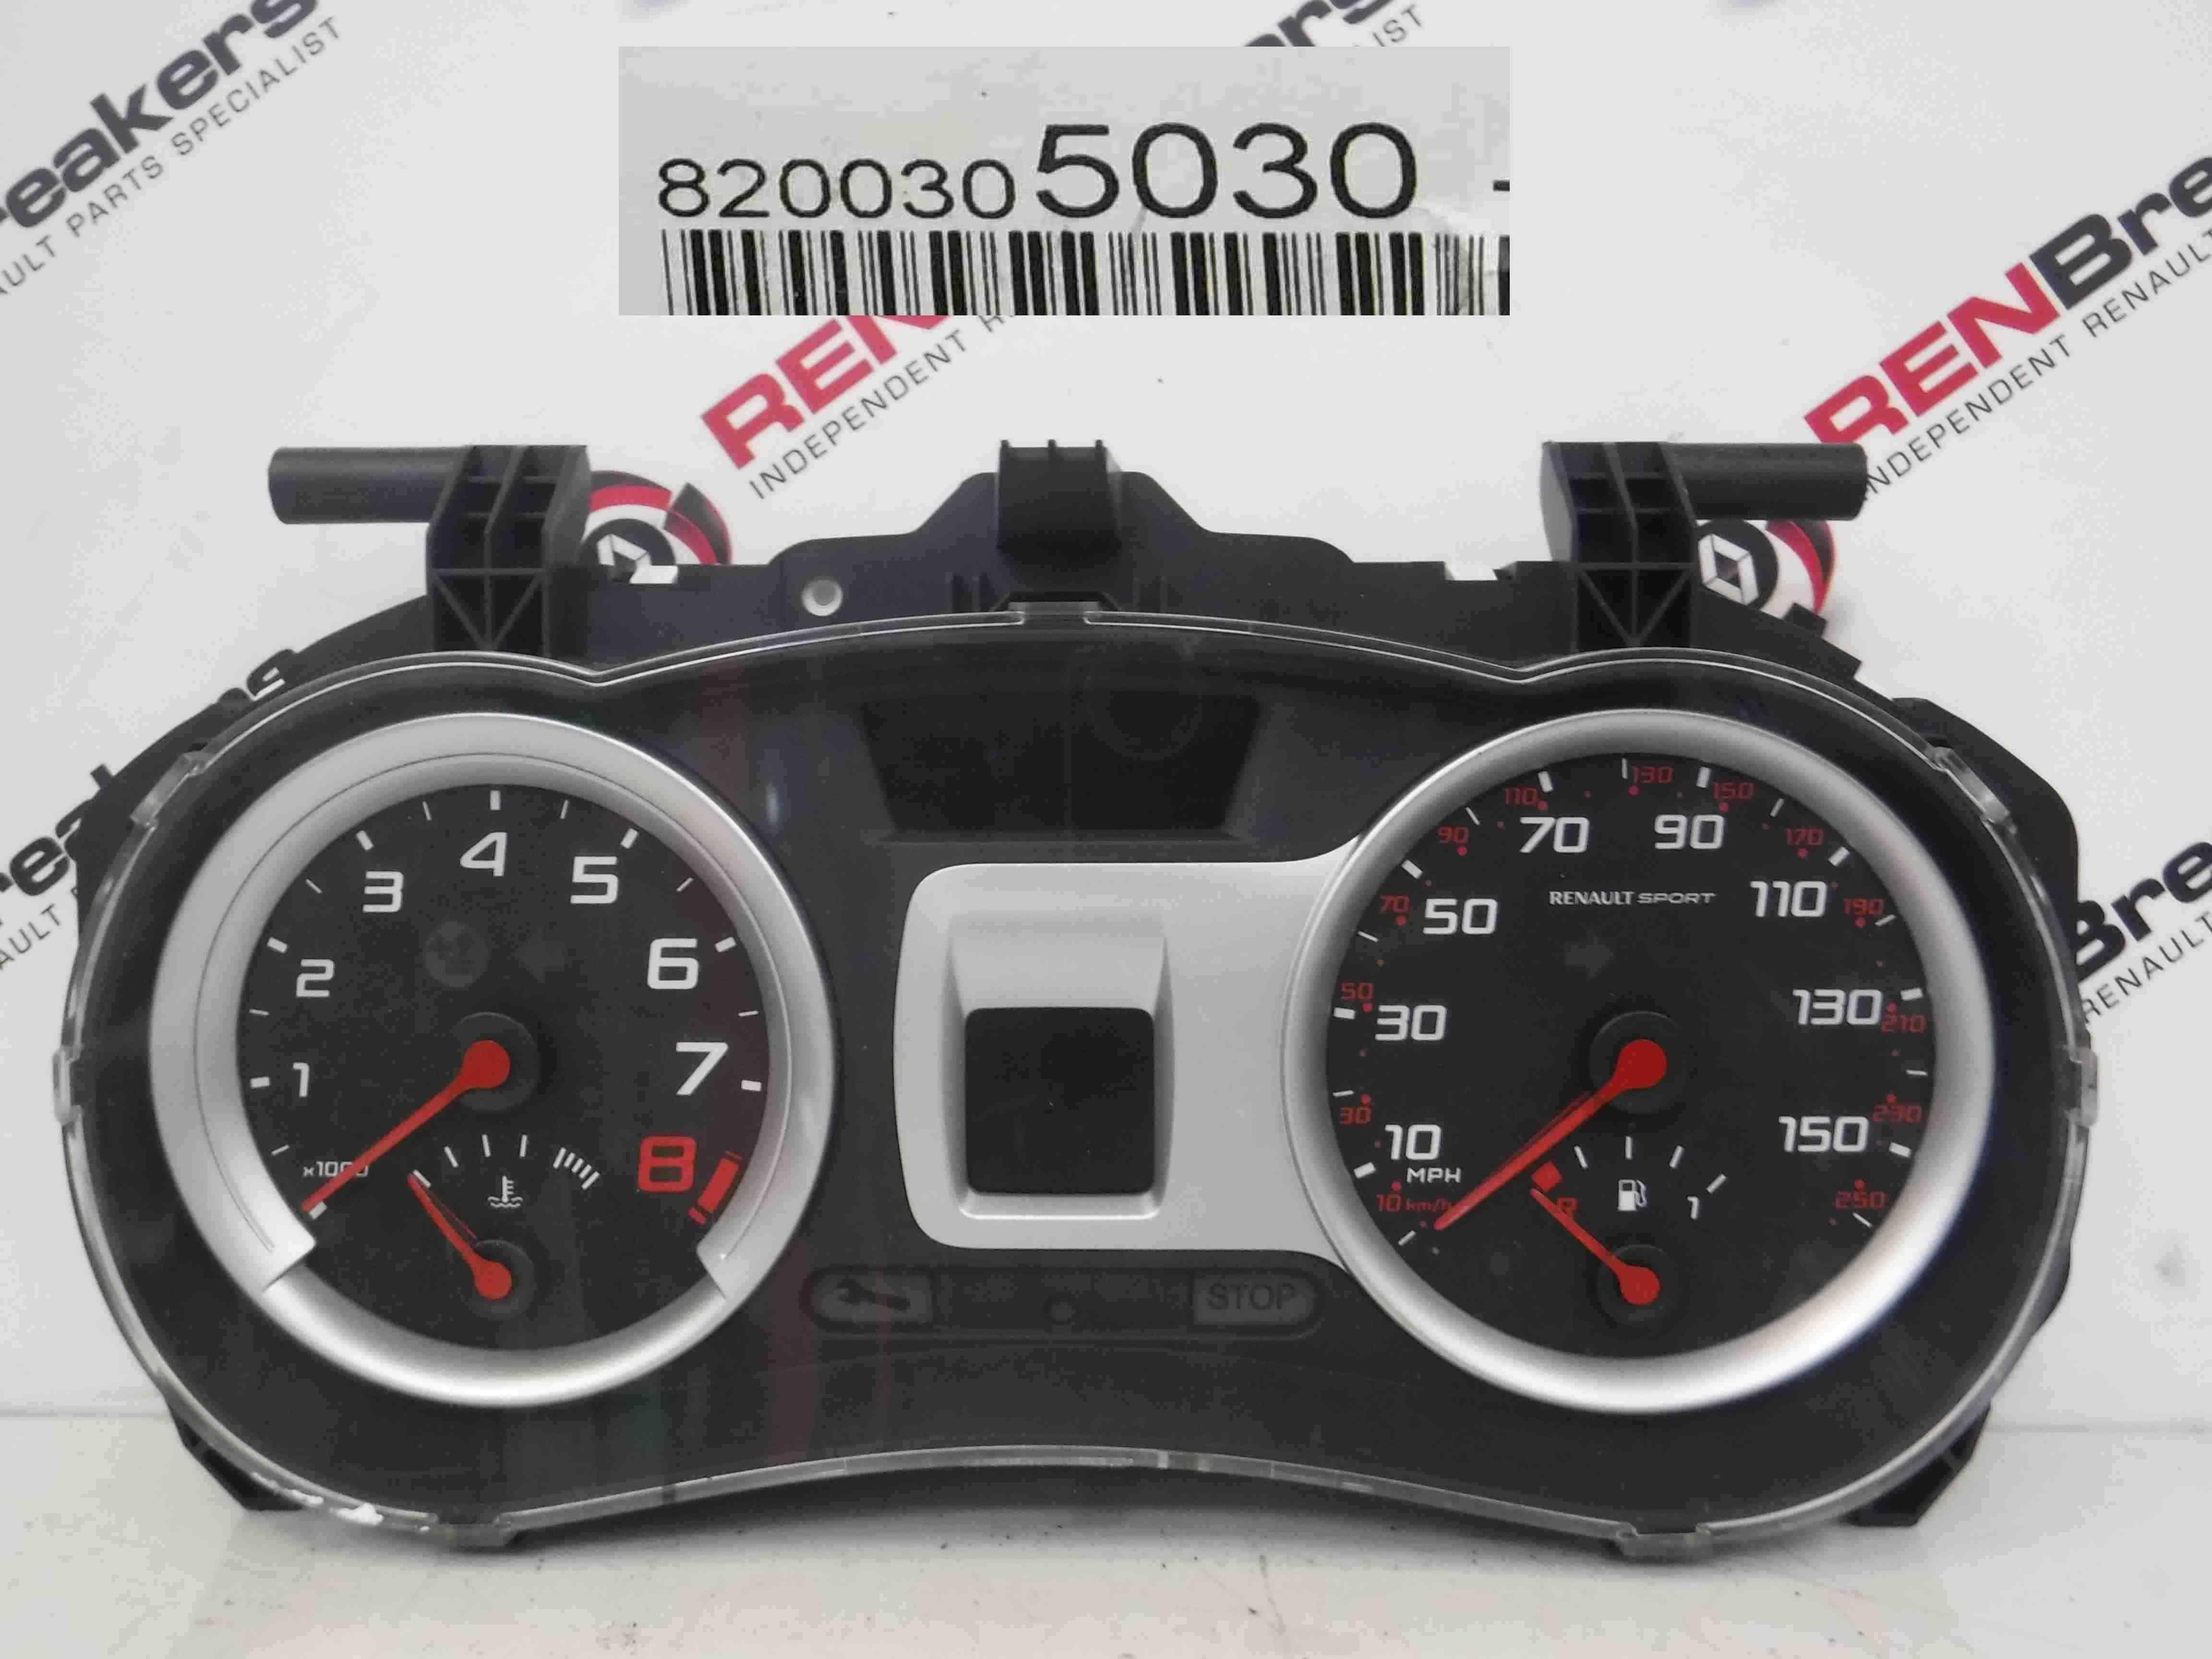 Renault Clio Sport 2005-2009 197 Instrument Panel Dials Clocks Gauges 96K